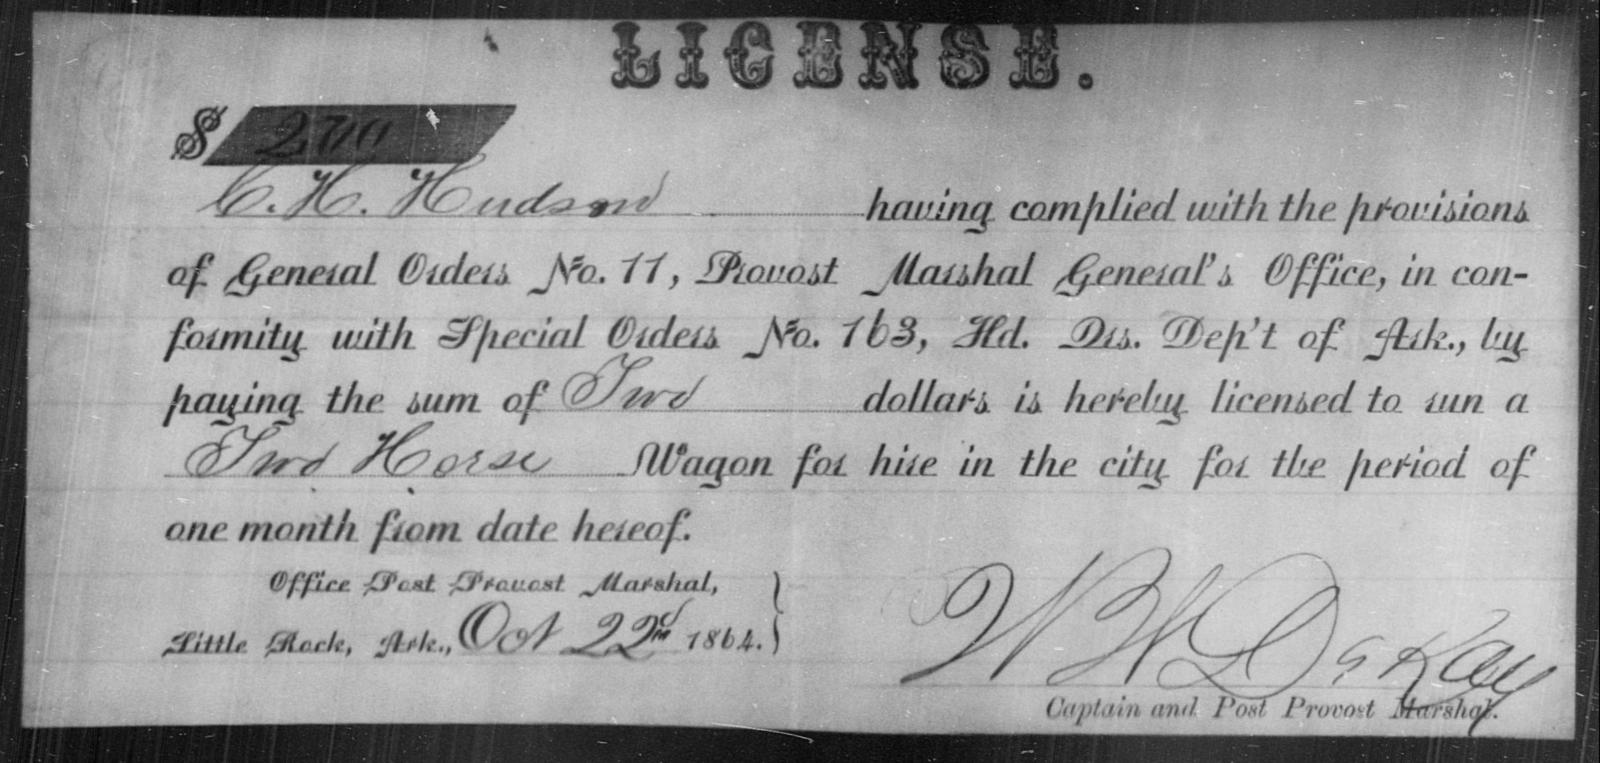 Hudrm, C H - State: Arkansas - Year: 1864